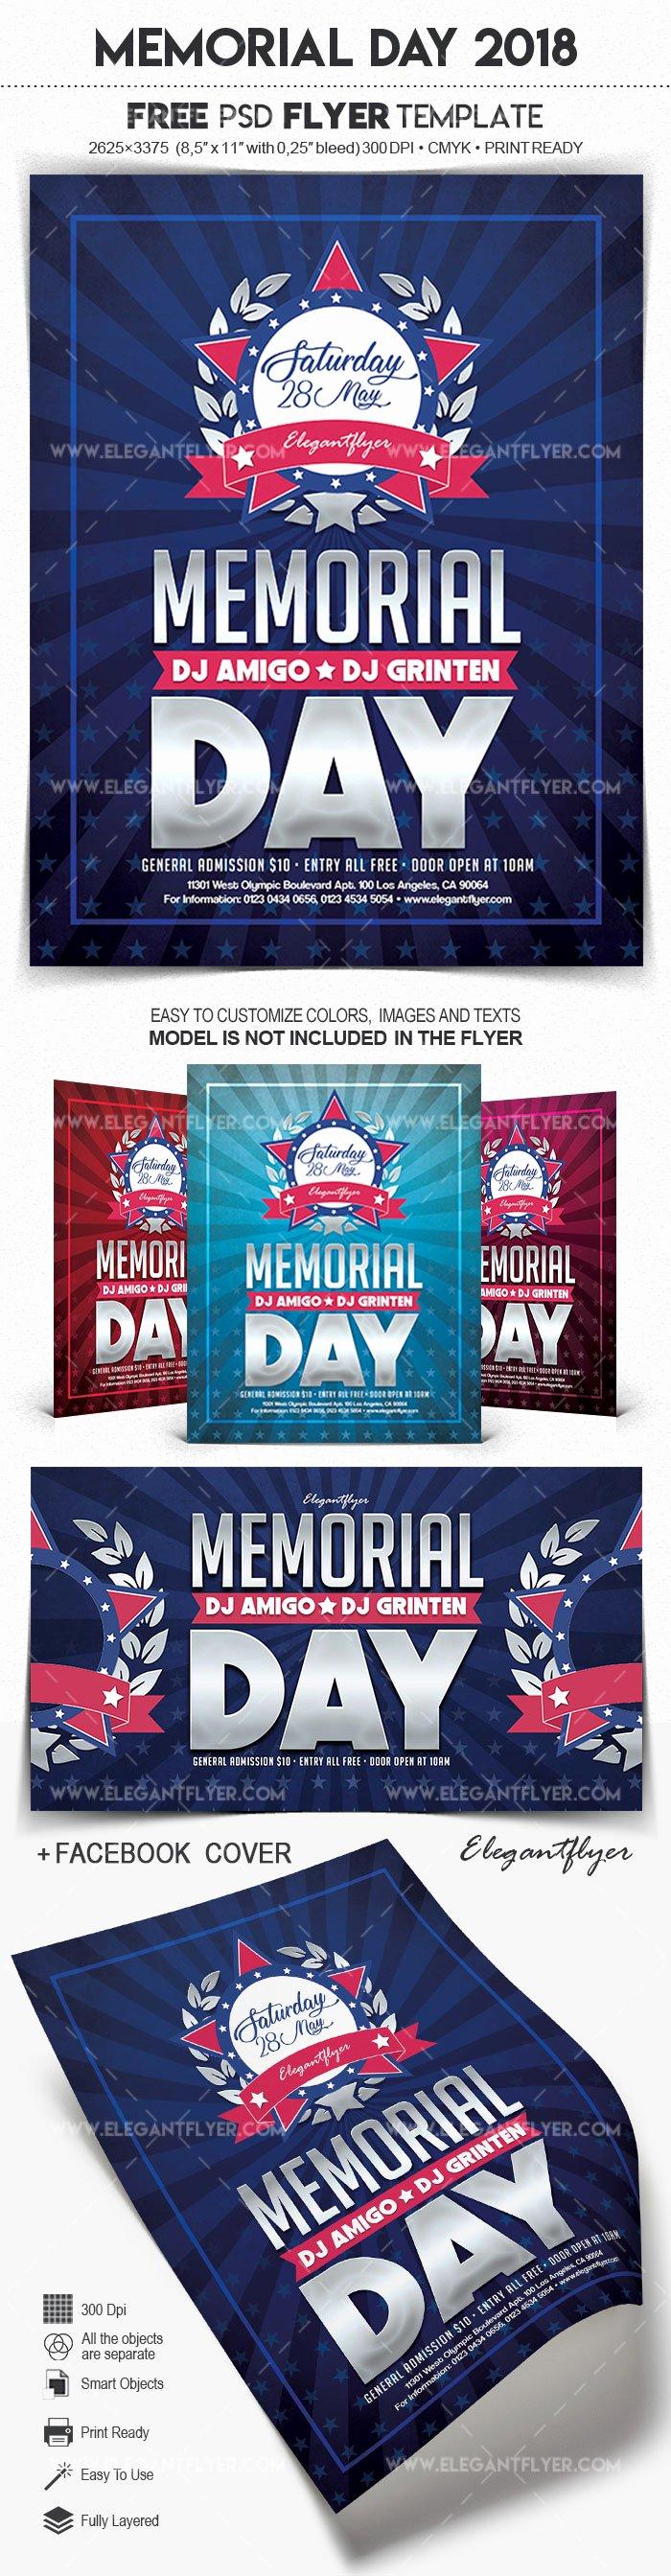 Memorial Day Flyer Template Free New Memorial Day 2018 – Free Flyer Psd Template – by Elegantflyer